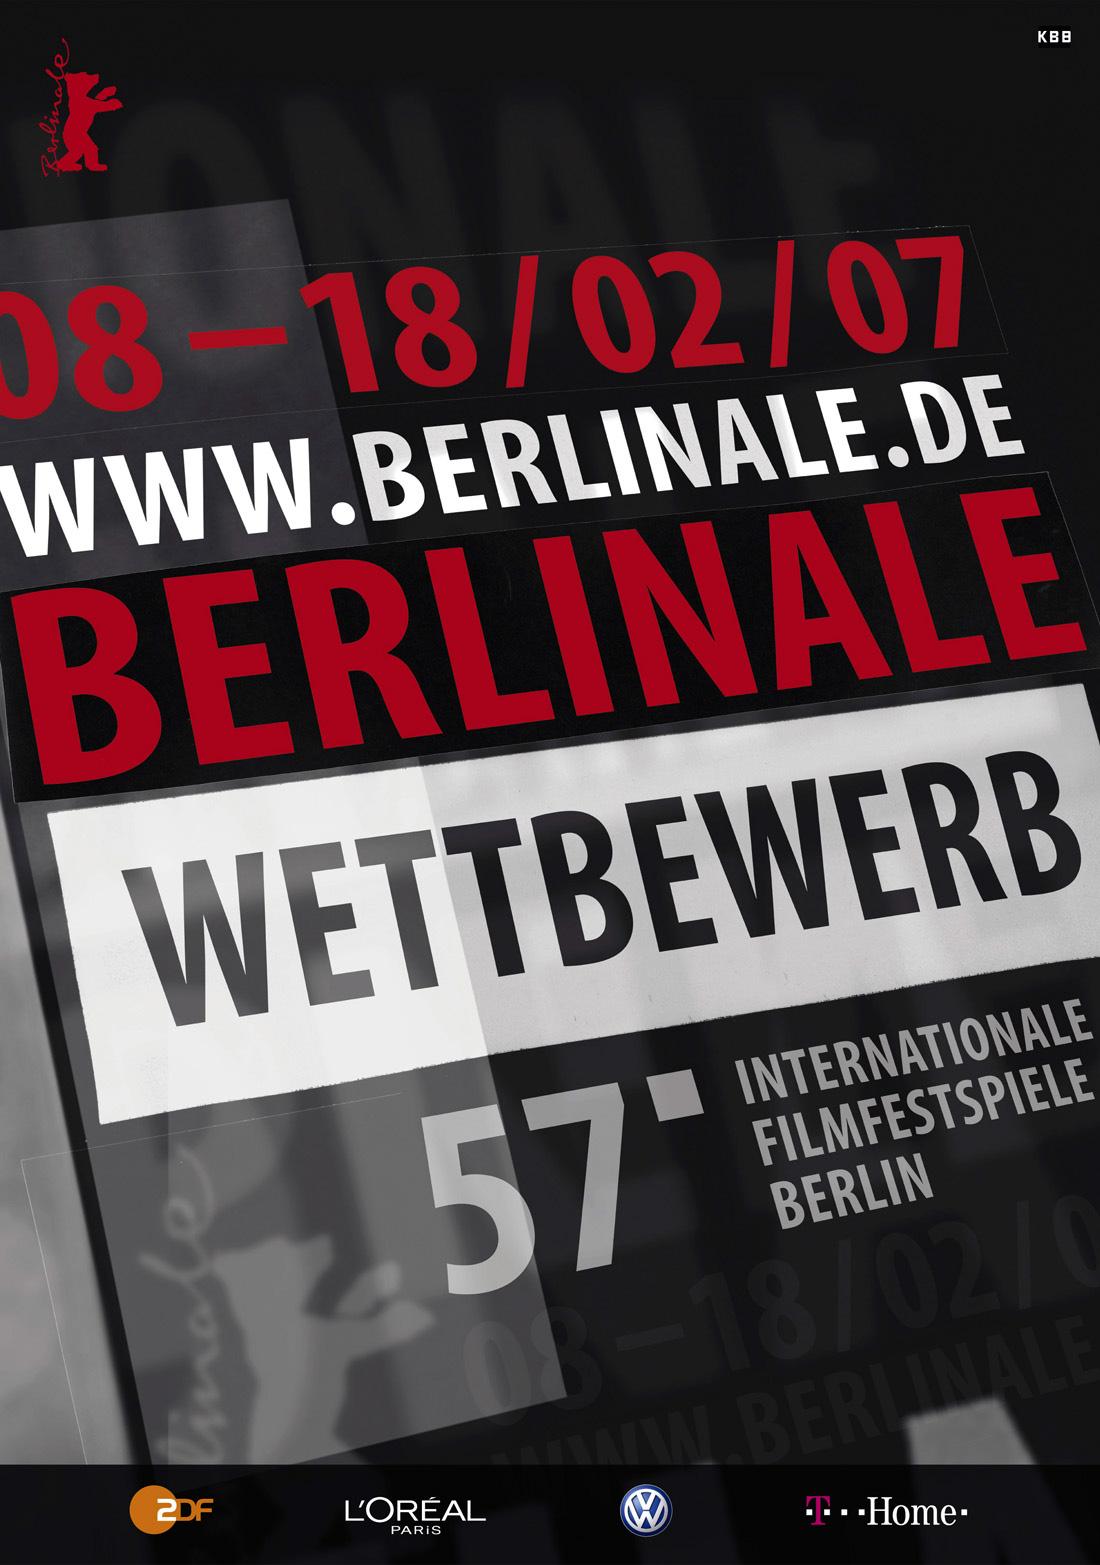 buchstabenplus, 57_berlinale